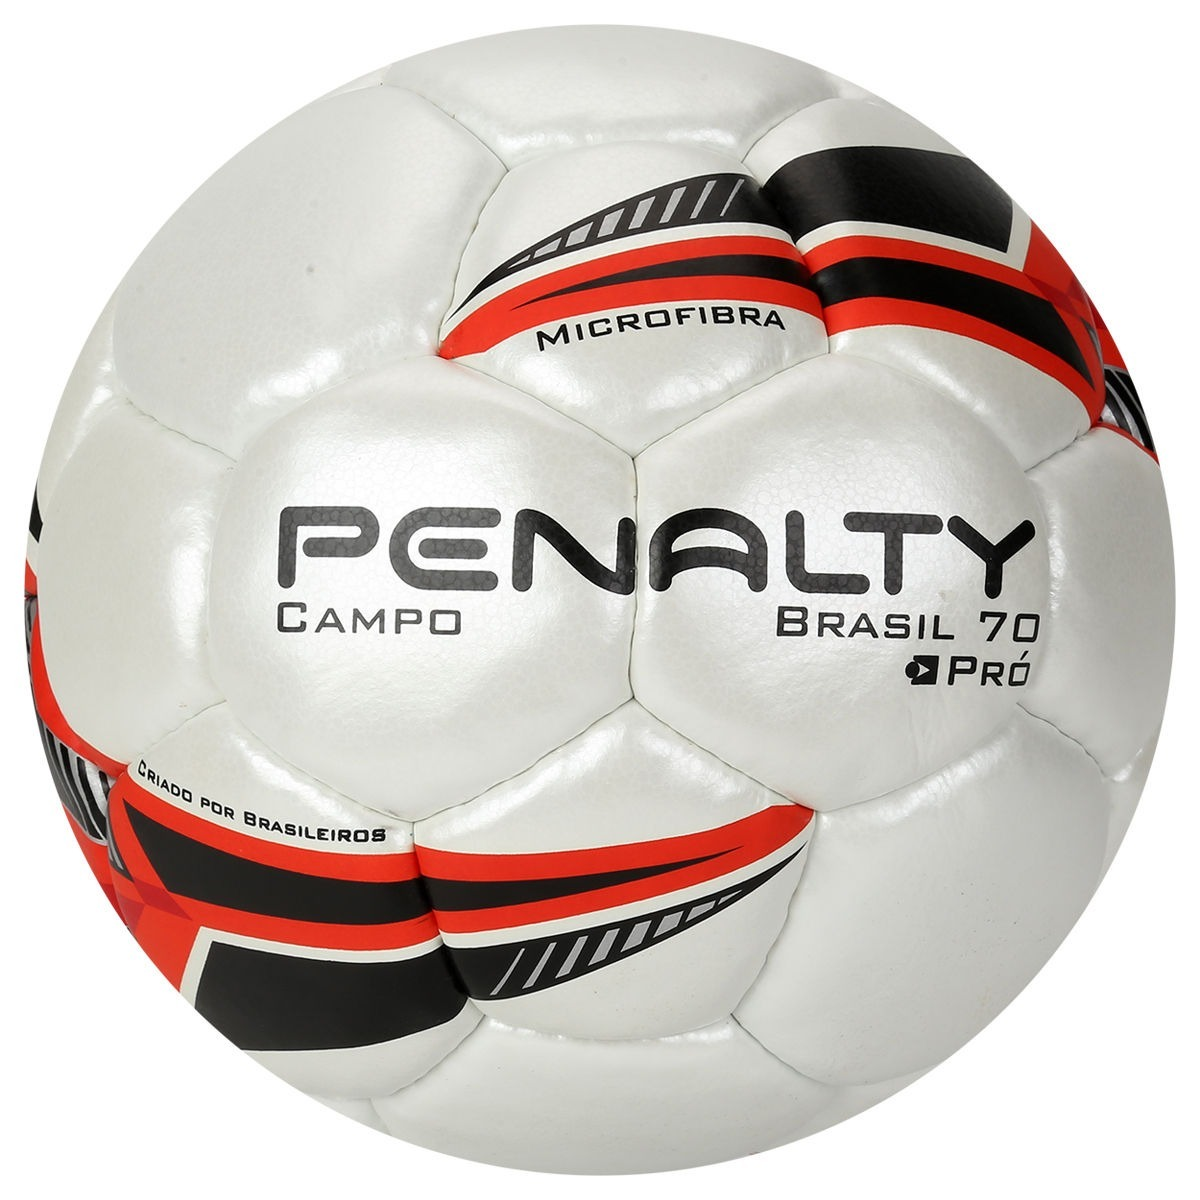 bdeb4c81fc2d7 bola futebol de campo penalty brasil 70 pró 5. Carregando zoom.